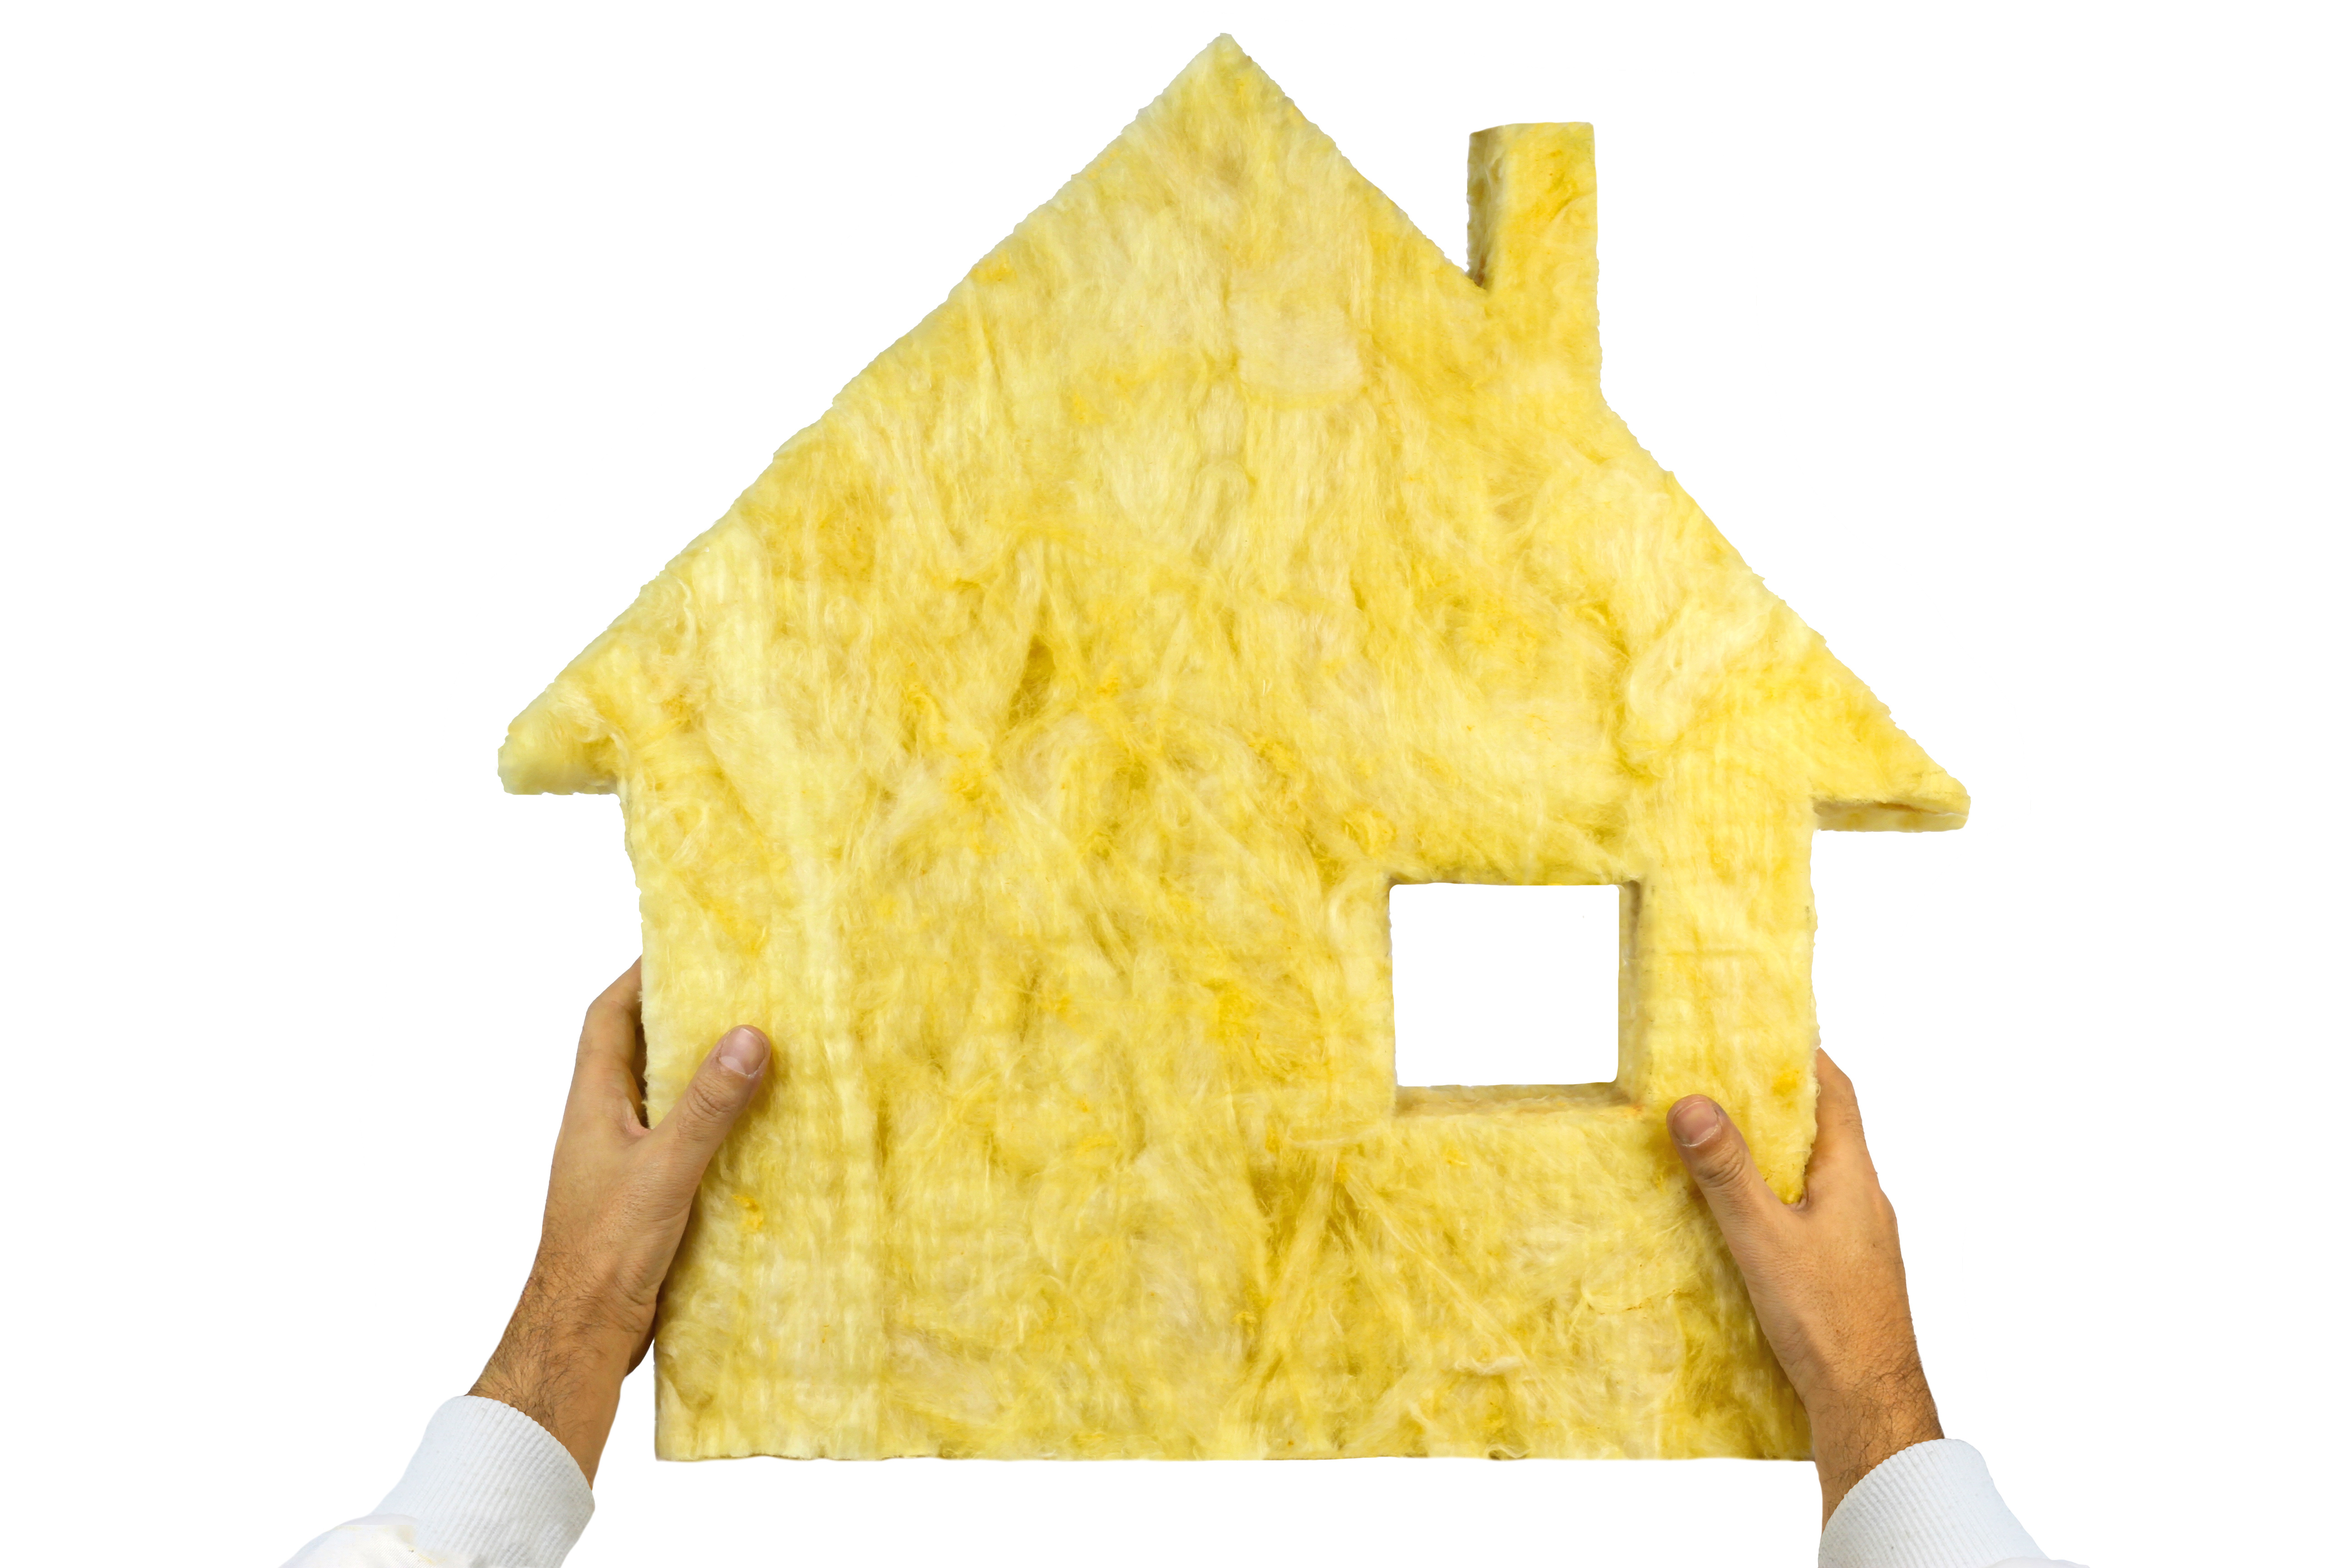 Wool insulation vs fiberglass insulation which is best for Rockwool insulation vs fiberglass